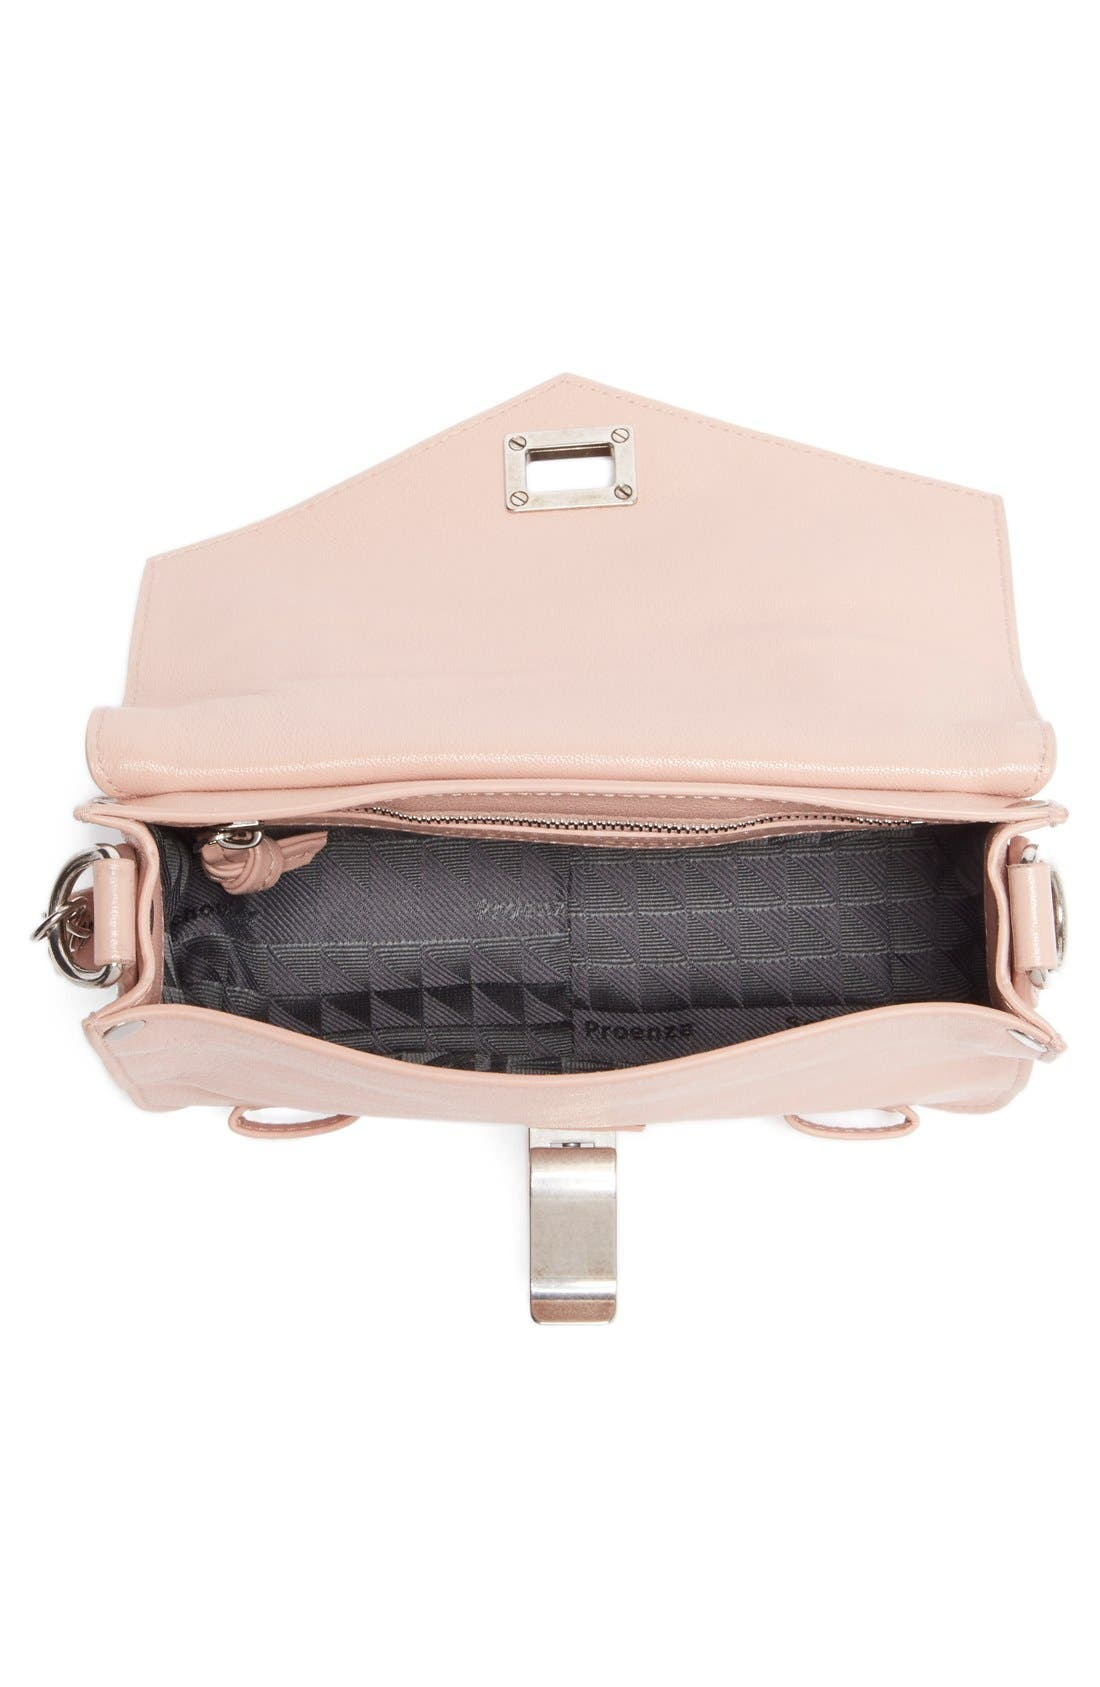 'Mini PS1' Lambskin Leather Crossbody Bag,                             Alternate thumbnail 11, color,